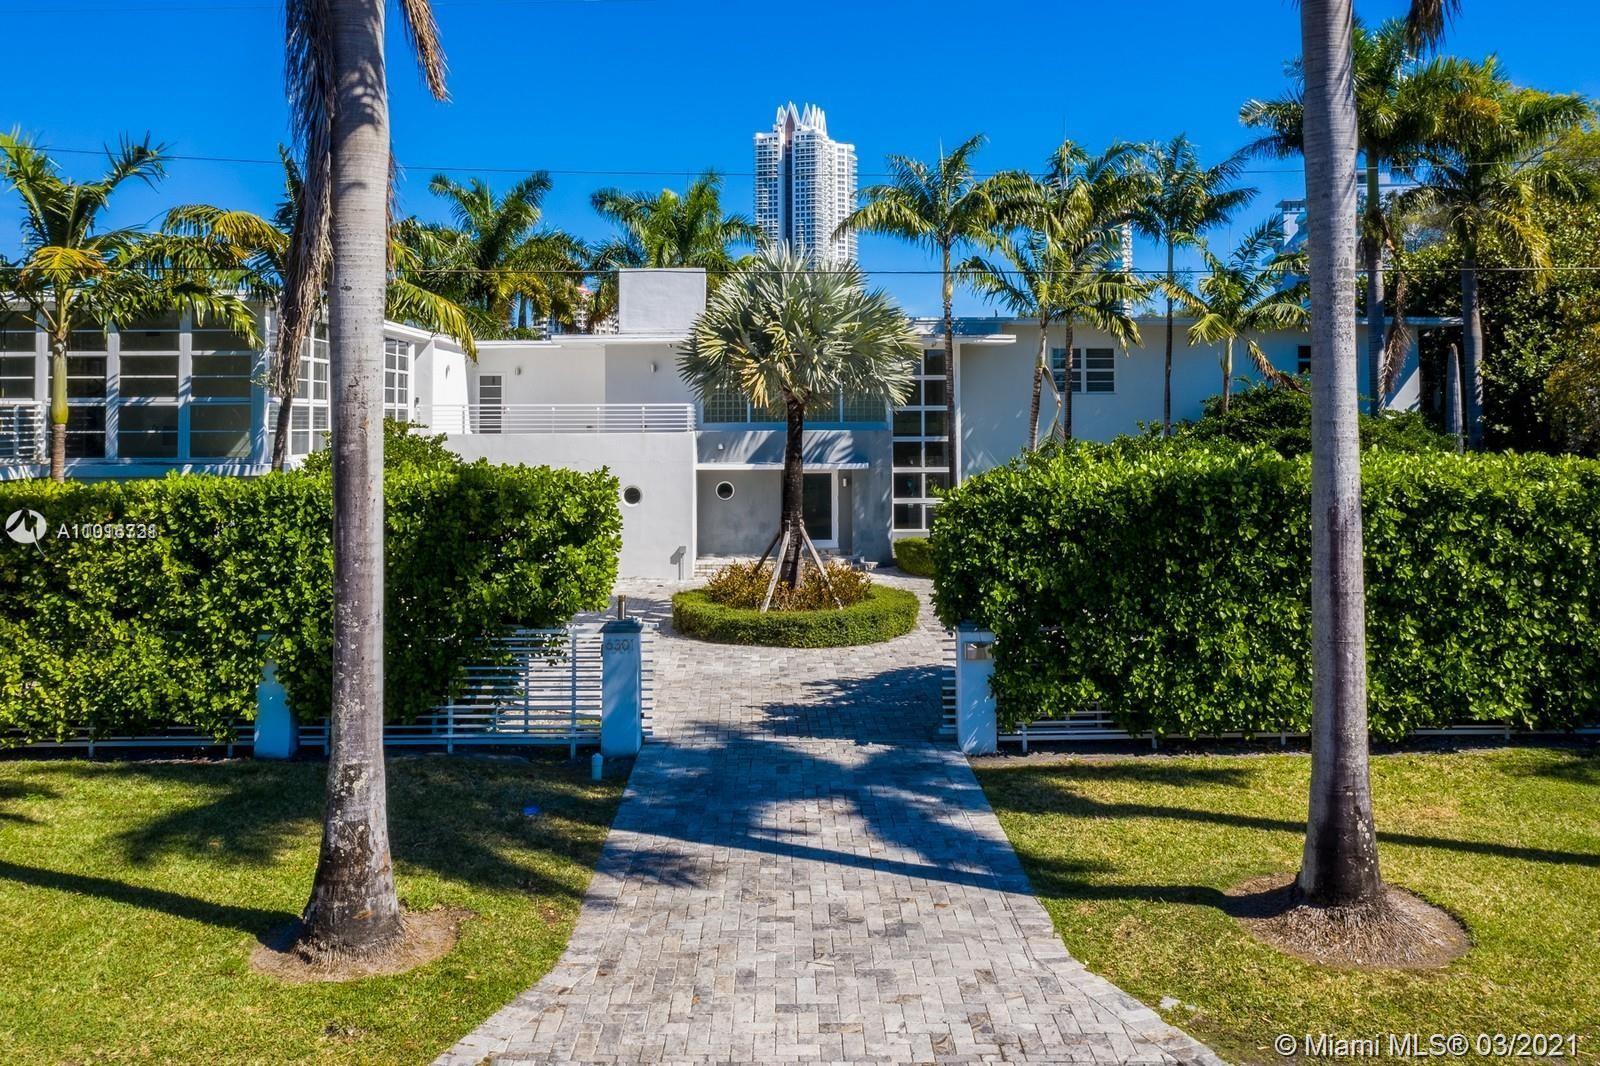 6301 Pine Tree Dr. Luxury Real Estate